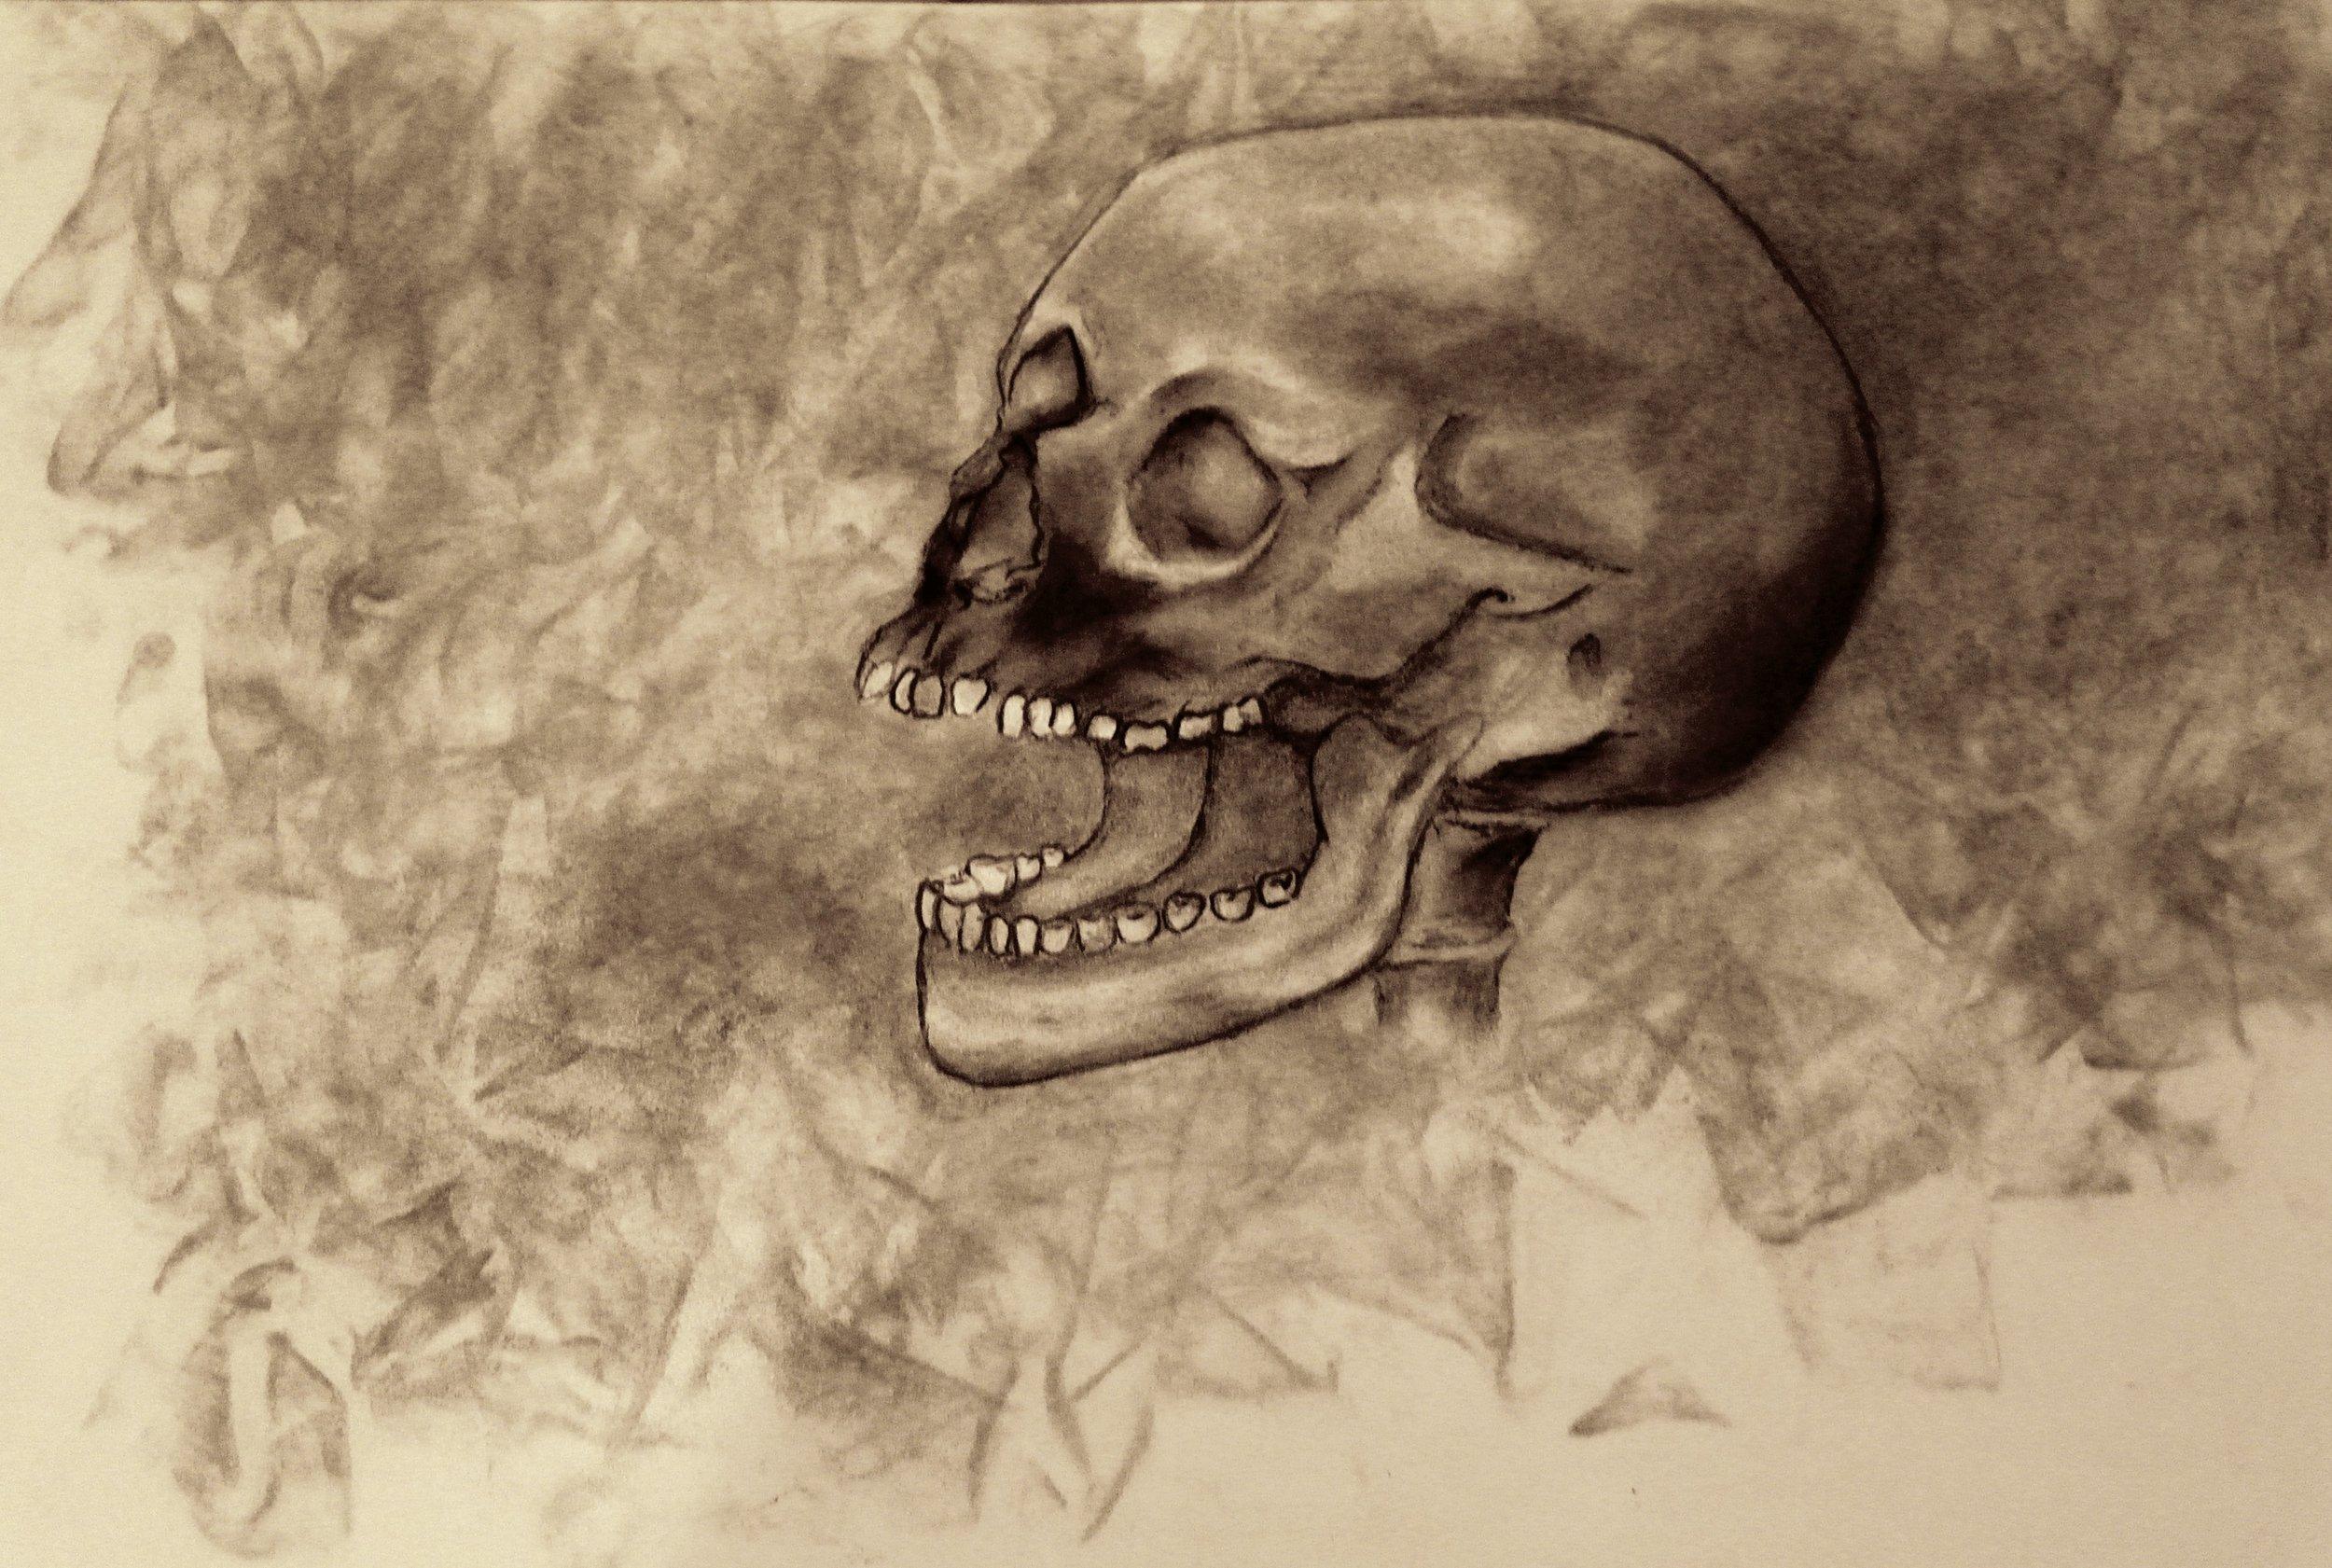 Skull_smoke.jpg